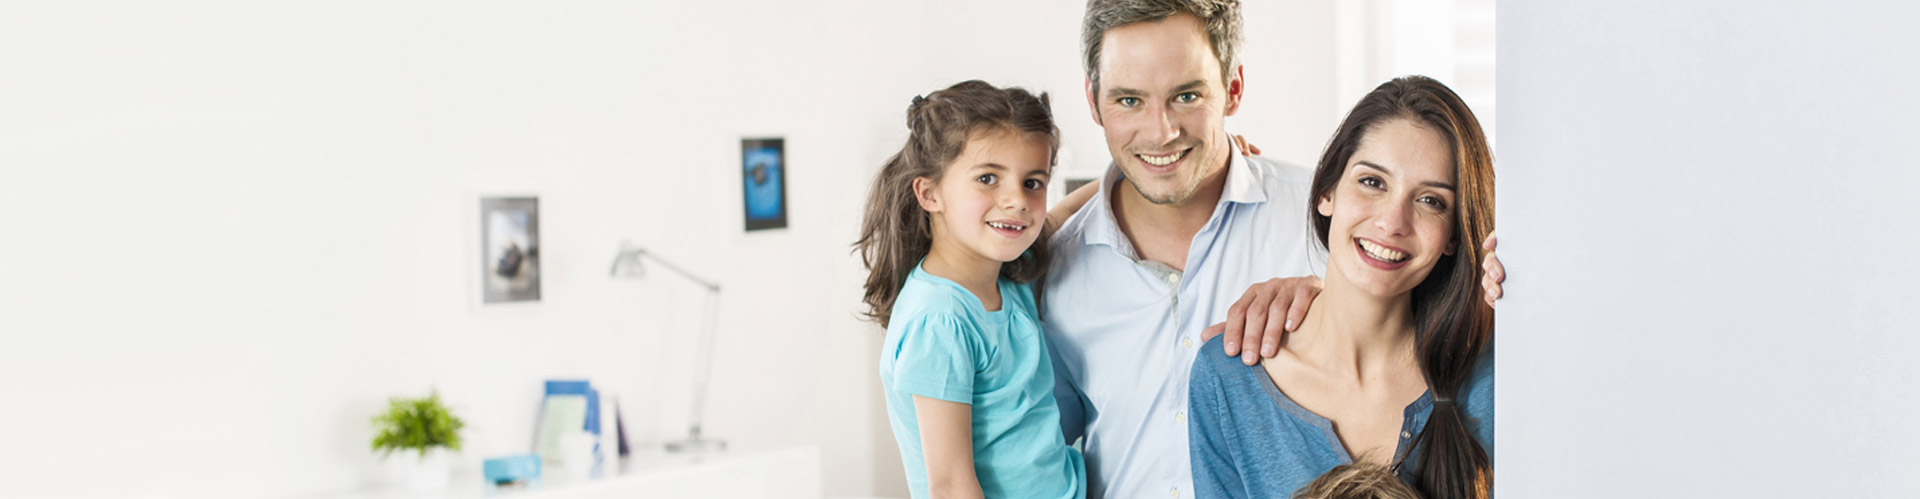 ratgeber immobilienkauf remax immobilien augsburg. Black Bedroom Furniture Sets. Home Design Ideas